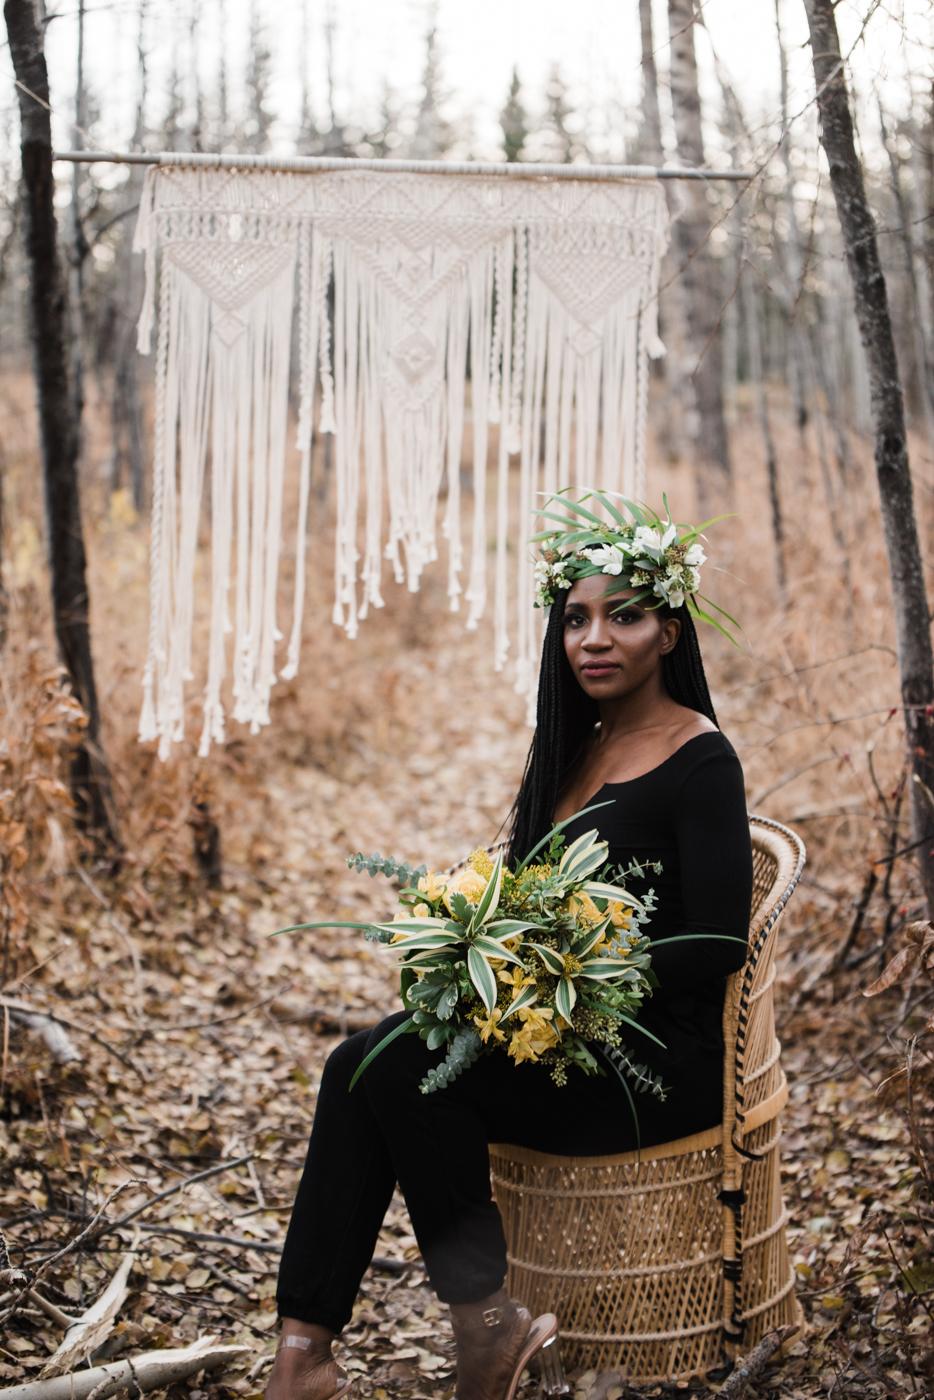 FortSt.John_photographer_TyraEPhotography_Wedding_Couple_Family_Photograhy_DawsonCreek_Elopement_Bride_Boduoir_Portraits-17.jpg